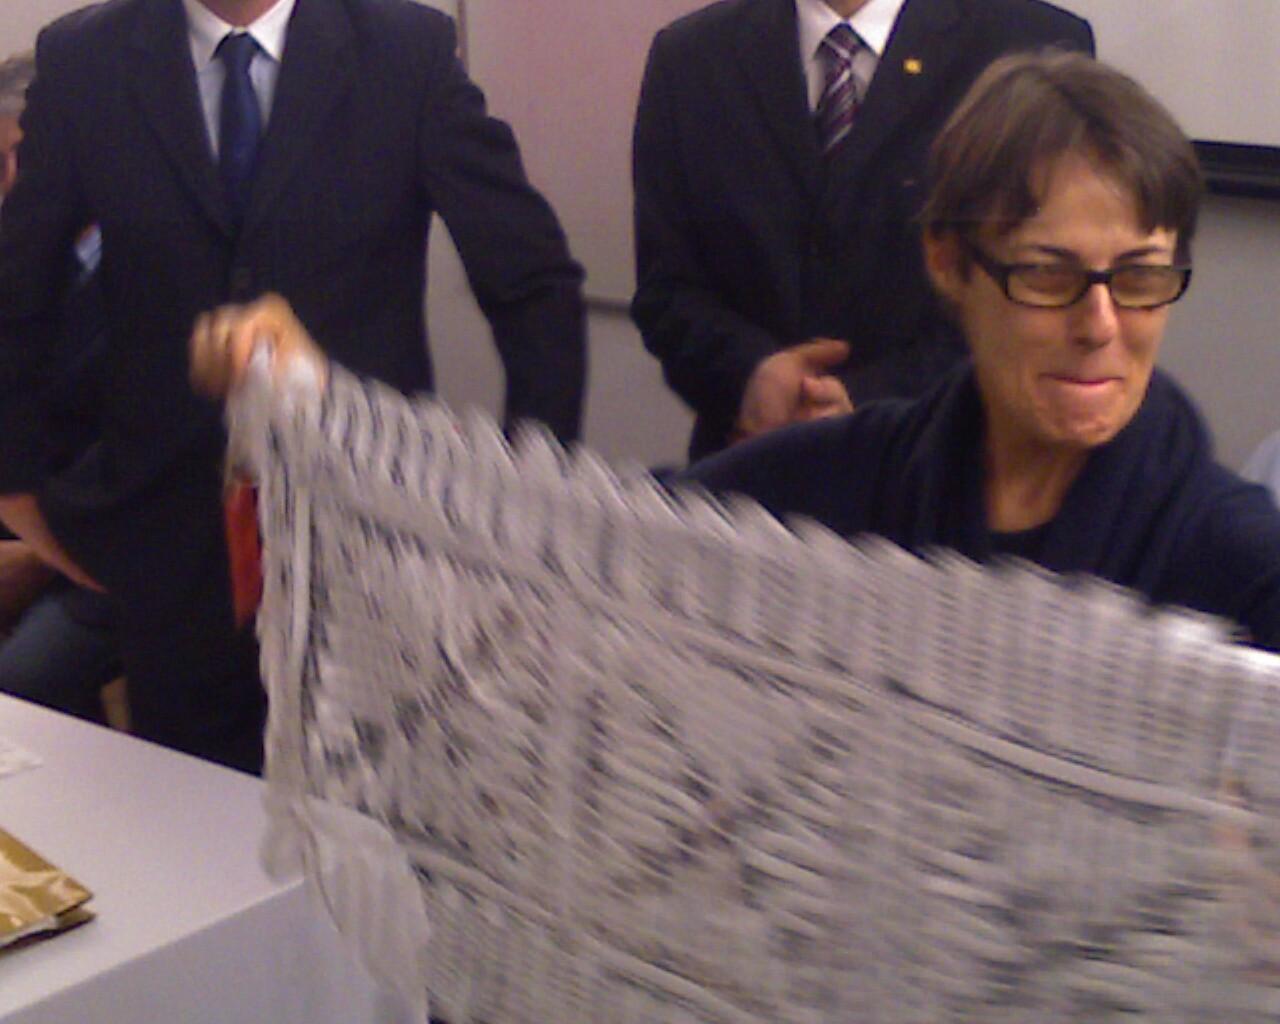 Ministra @anadehollanda ganha renda de bilro